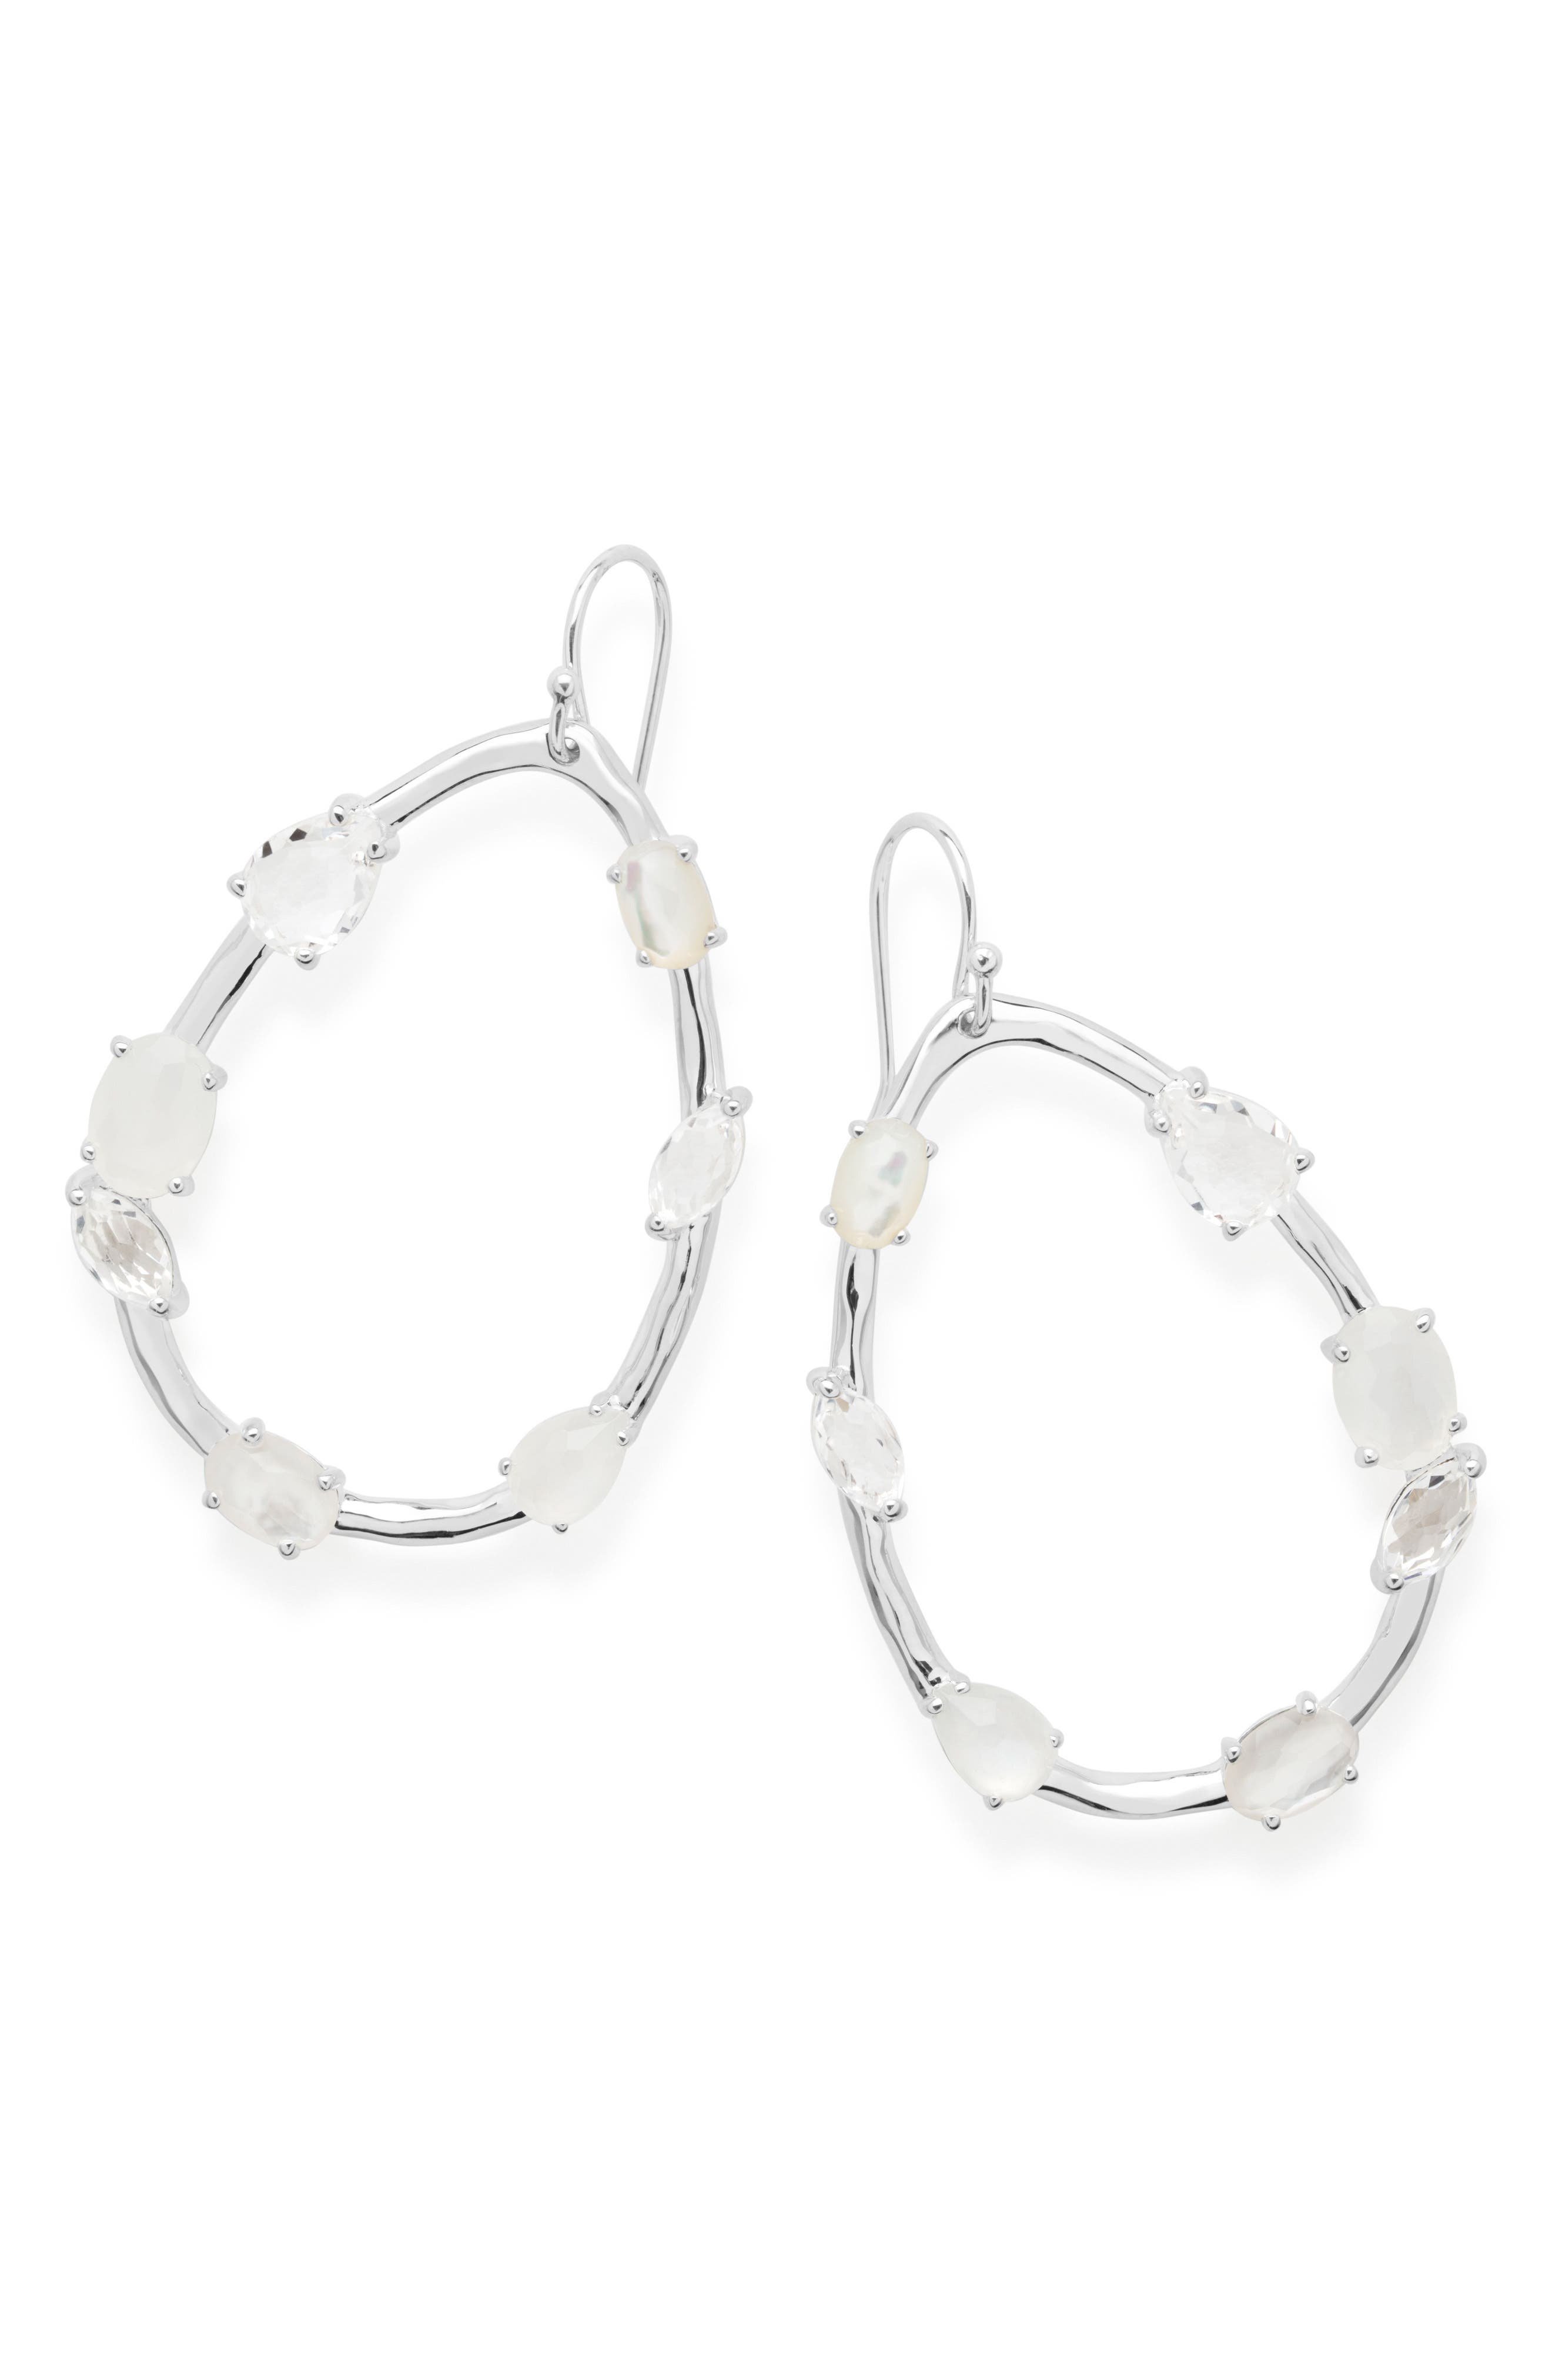 Main Image - Ippolita Rock Candy Drop Earrings